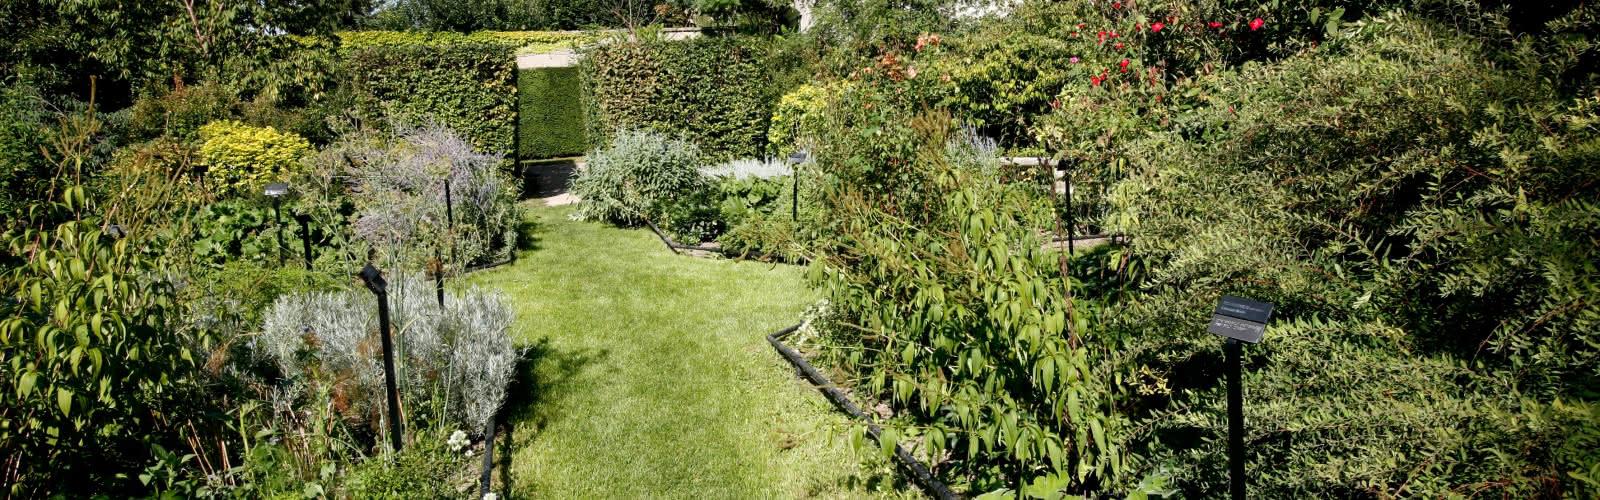 Jardin des 5 Sens - Pontoise